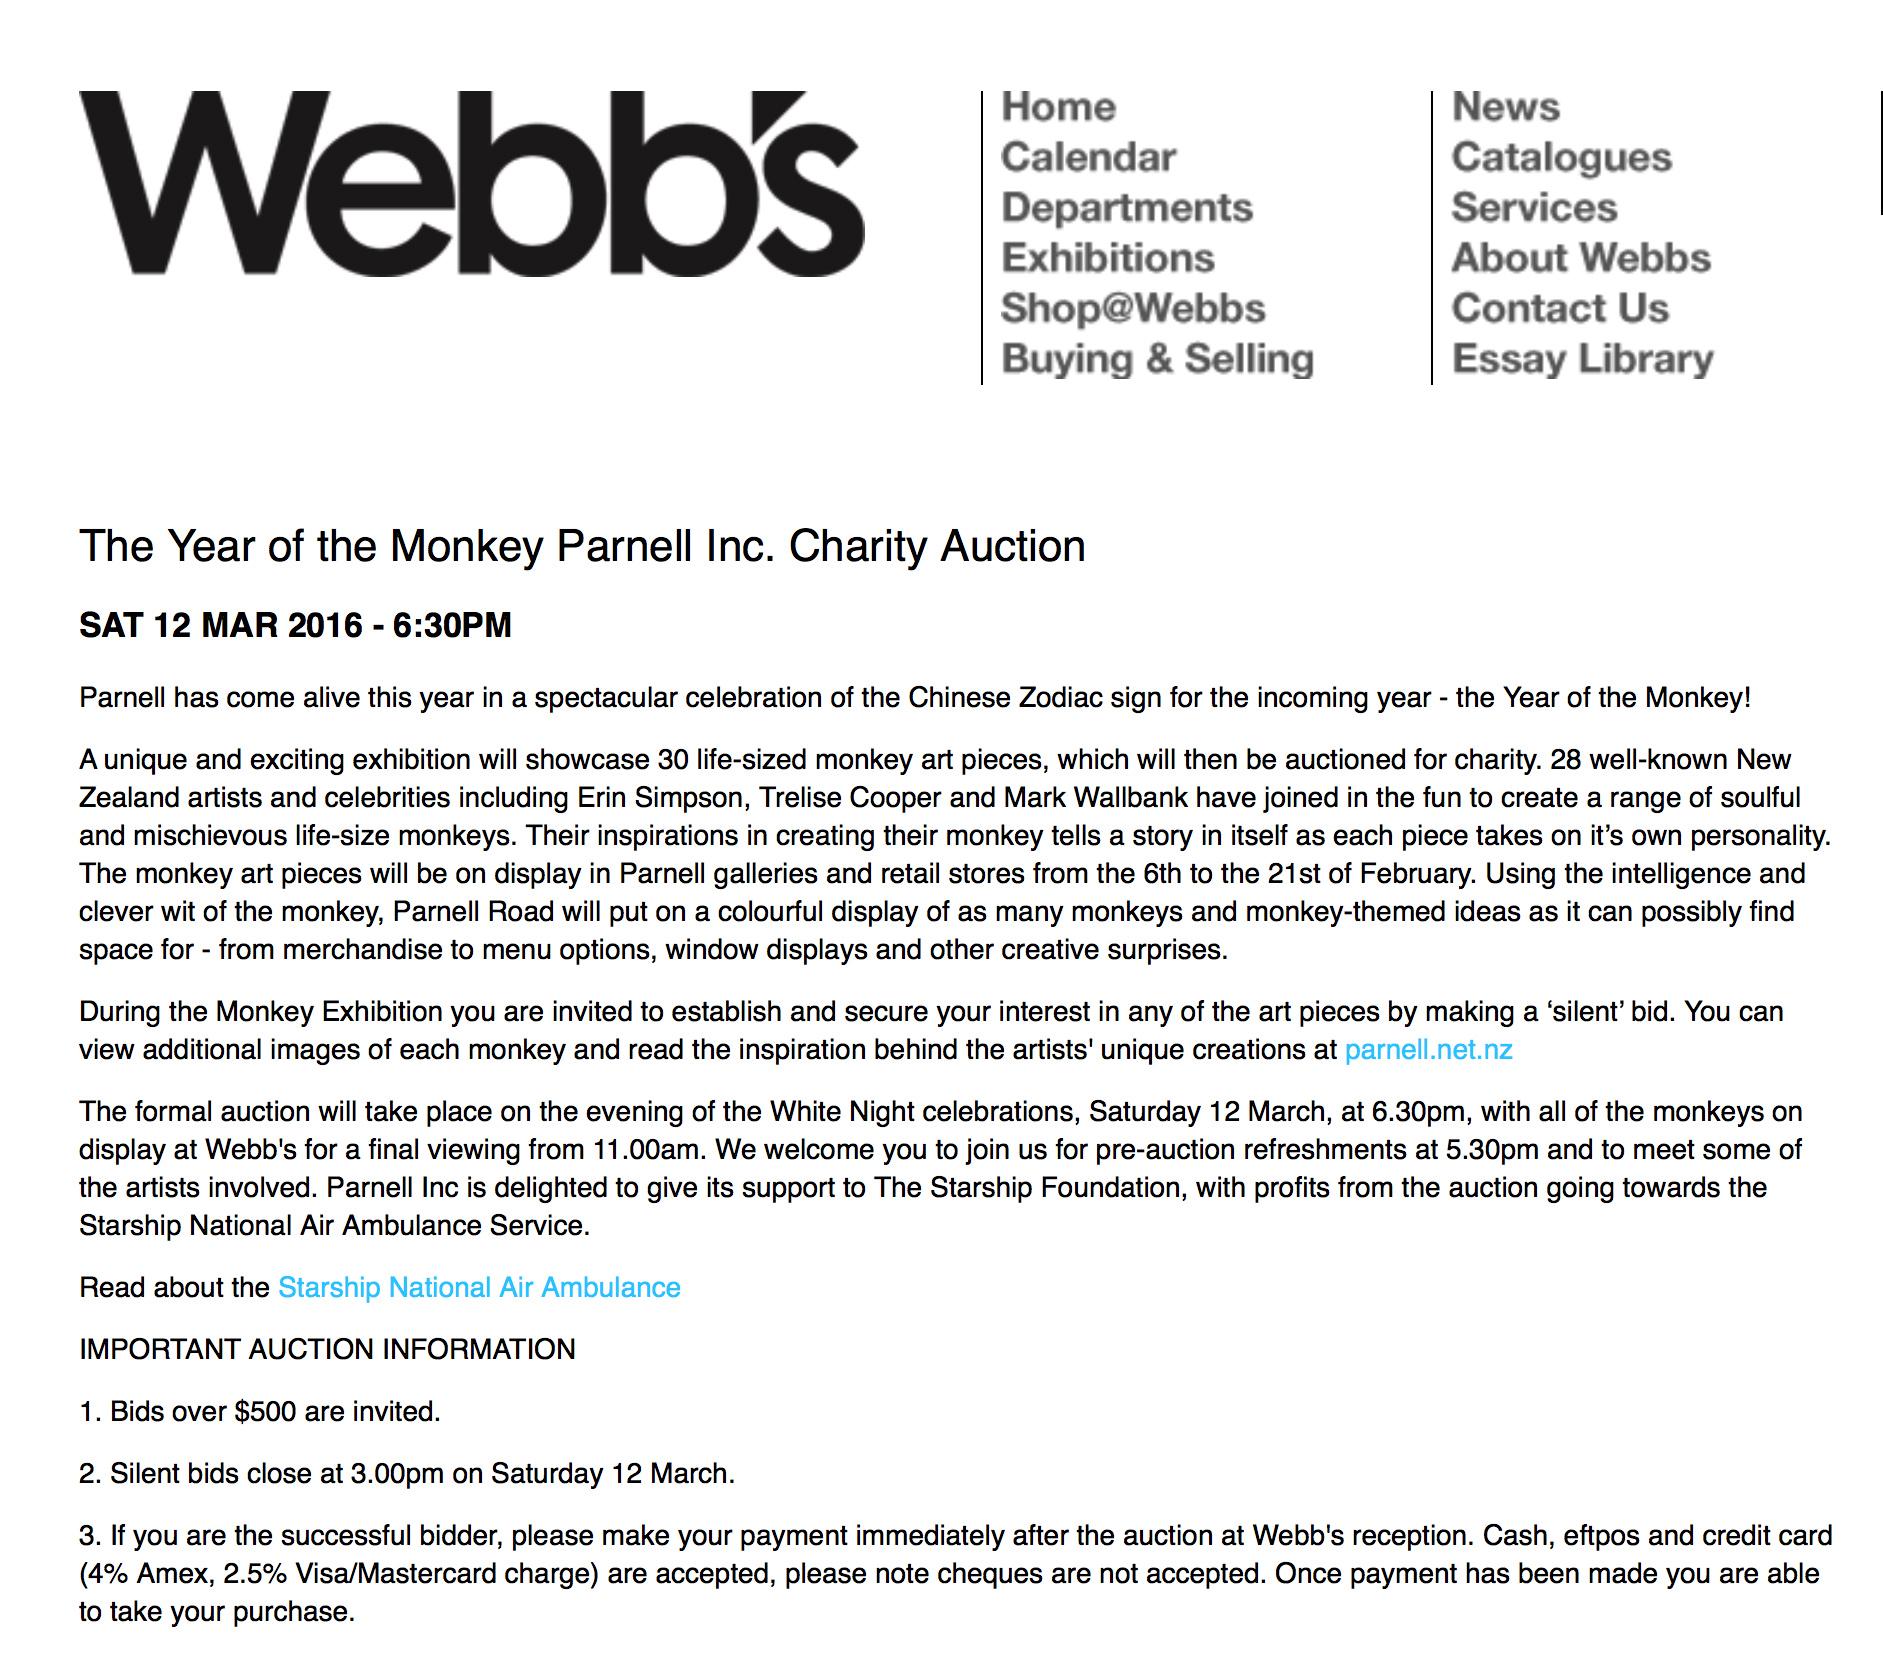 auction2.jpg